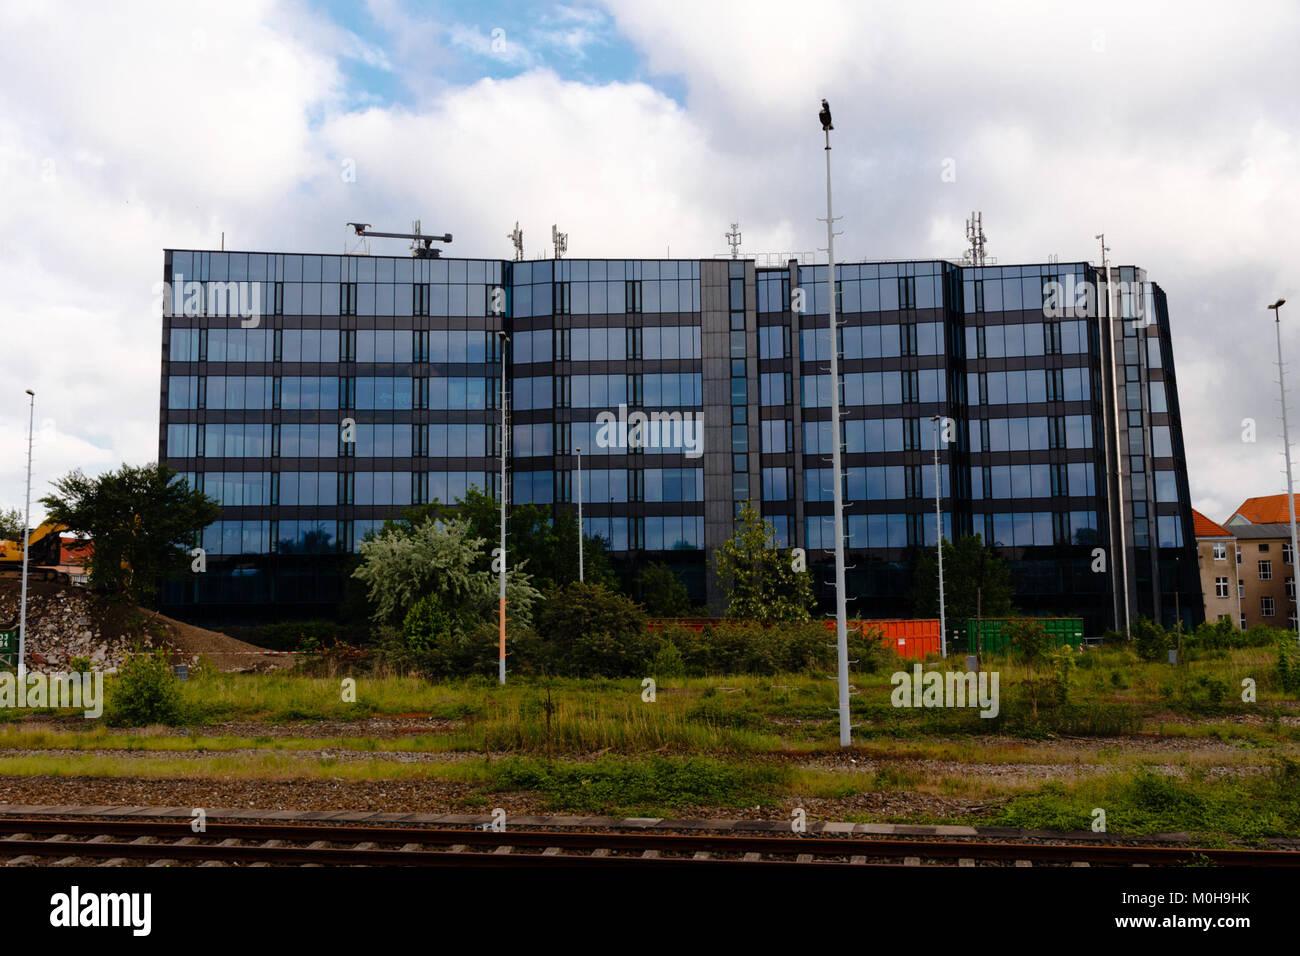 Bürogebäude am Güterbahnhof Wilmersdorf 20140518 2 Stockbild